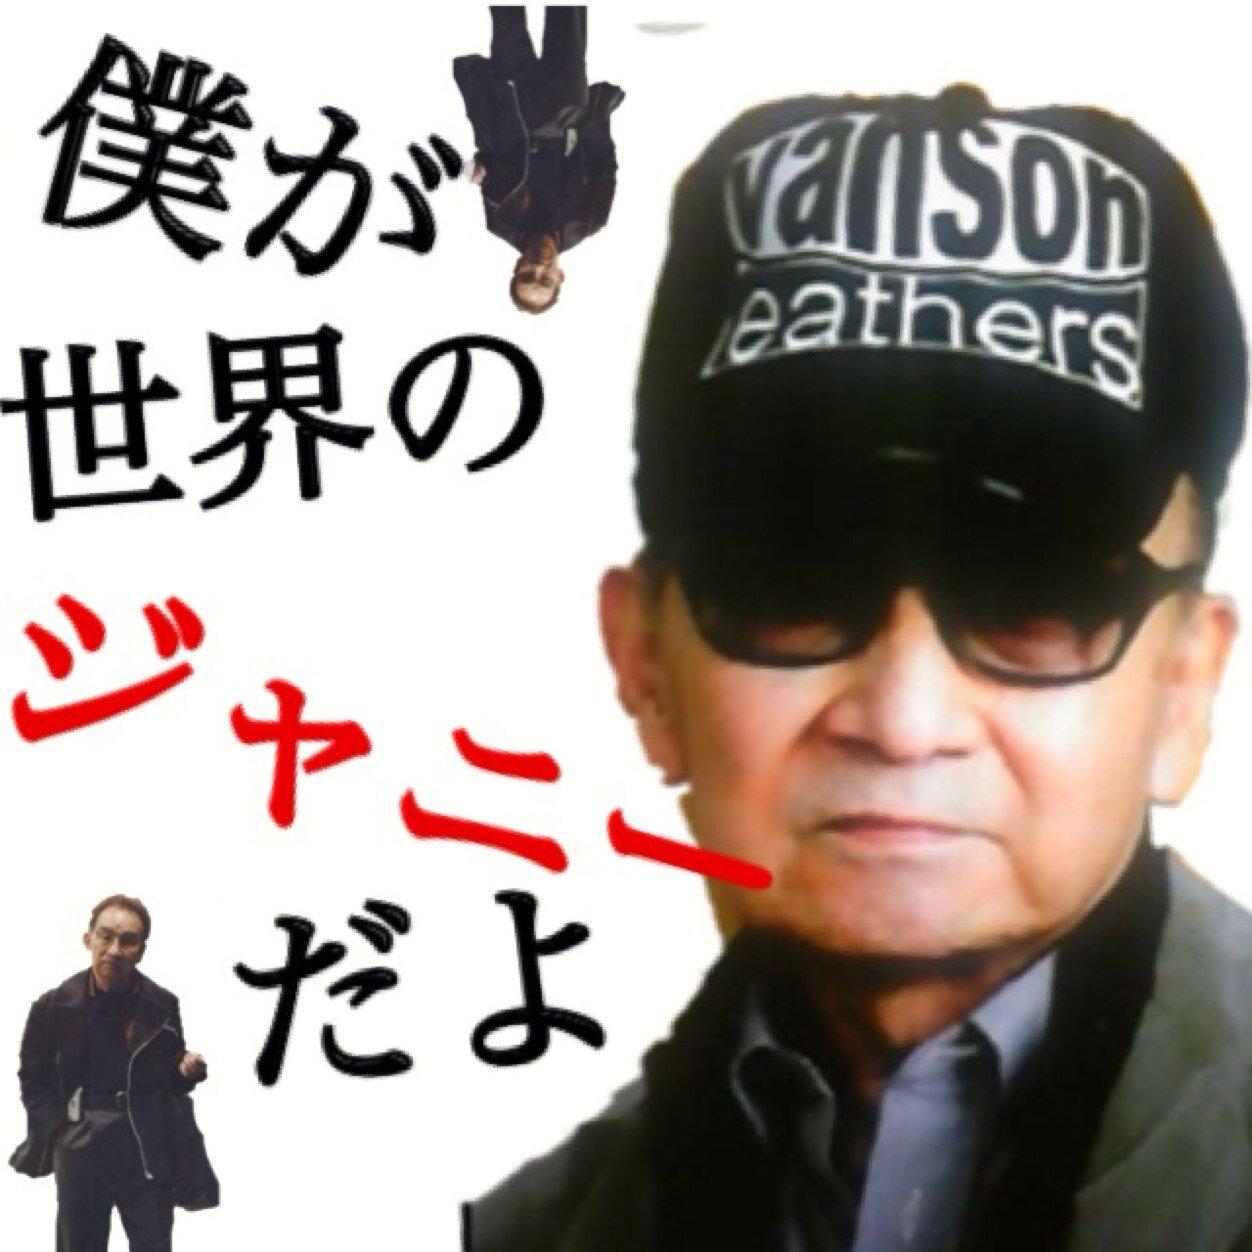 L3xPilGs - ジャニー喜多川の少年愛裁判の内容や被害者まとめ!お気に入りは誰?